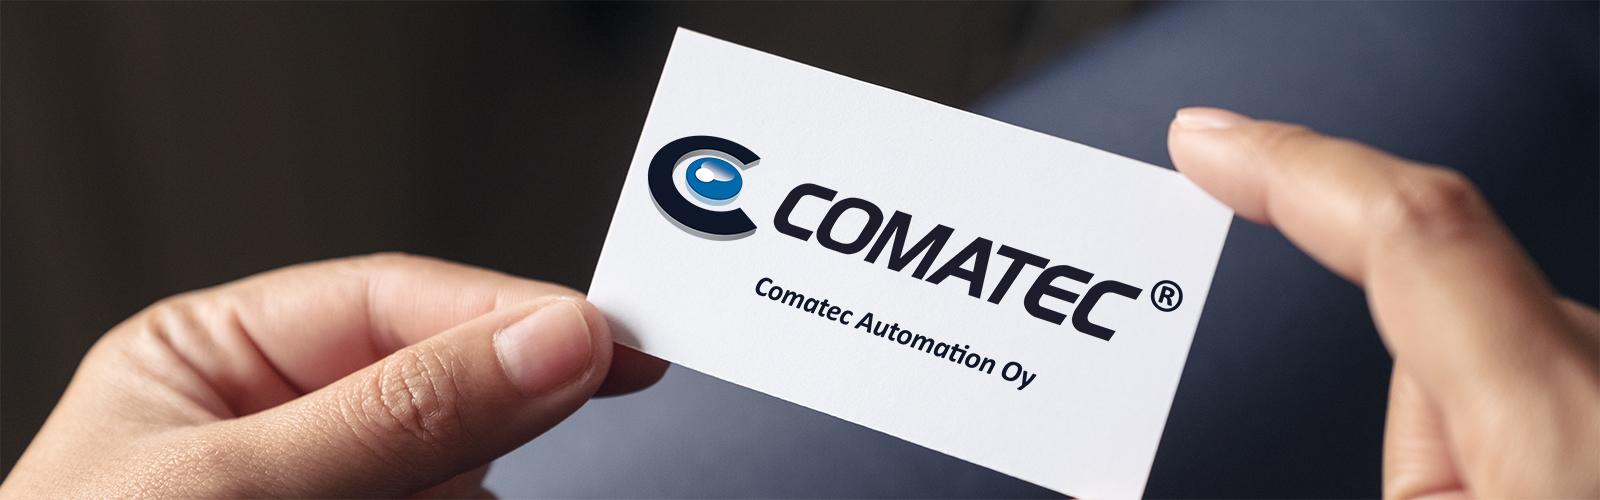 Comatec Automation